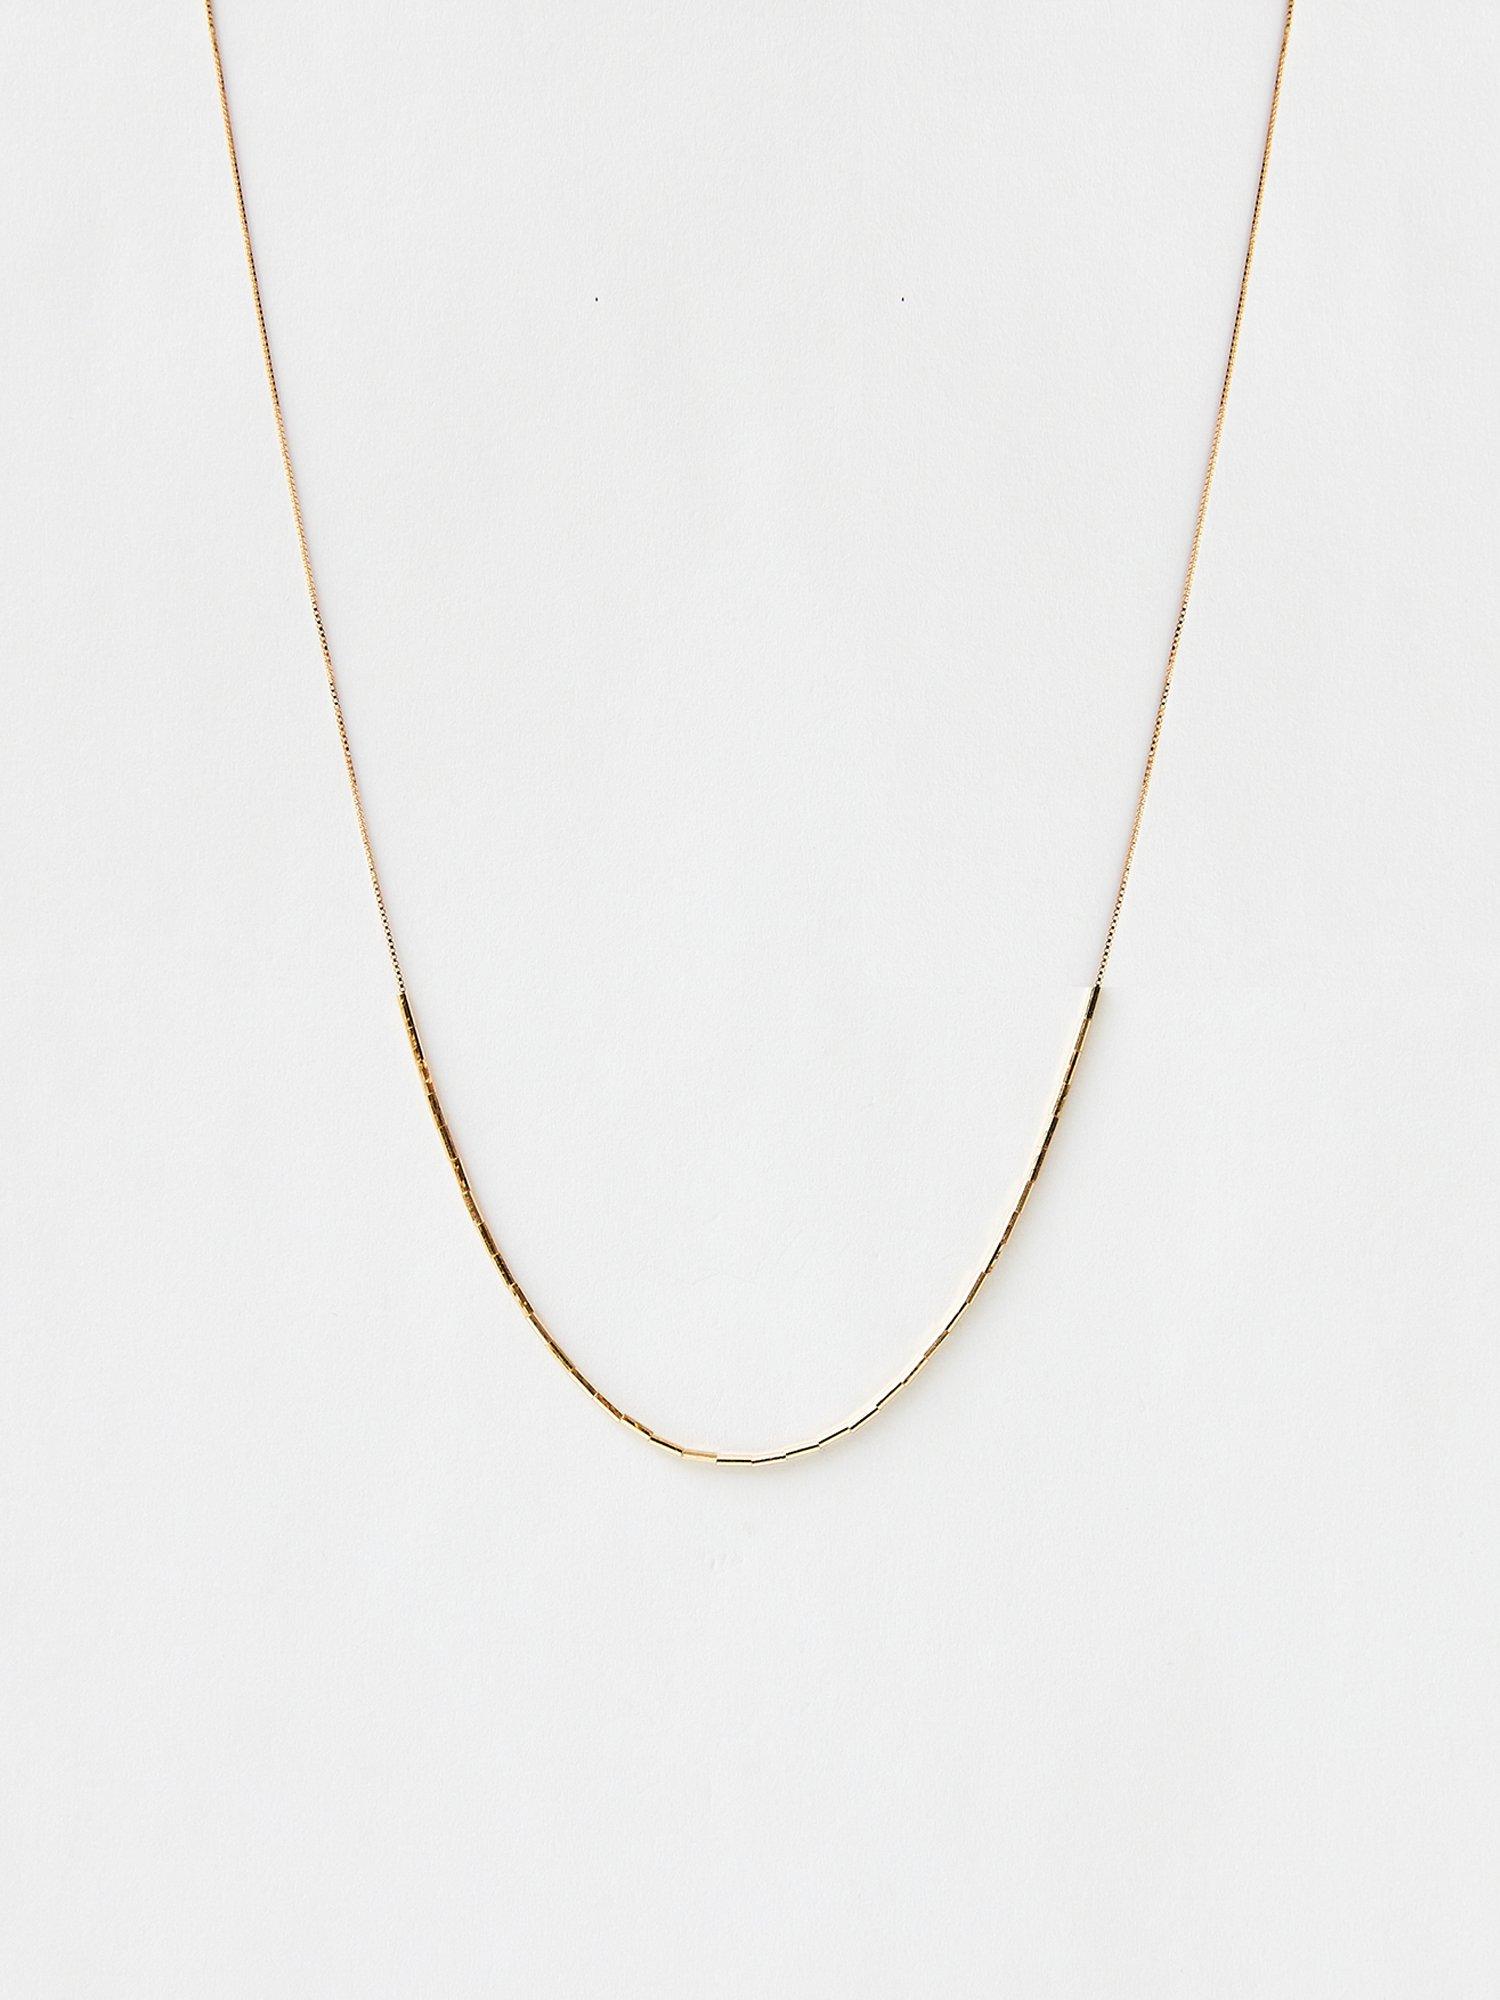 HISPANIA / Dazzling chain necklace / 420mm